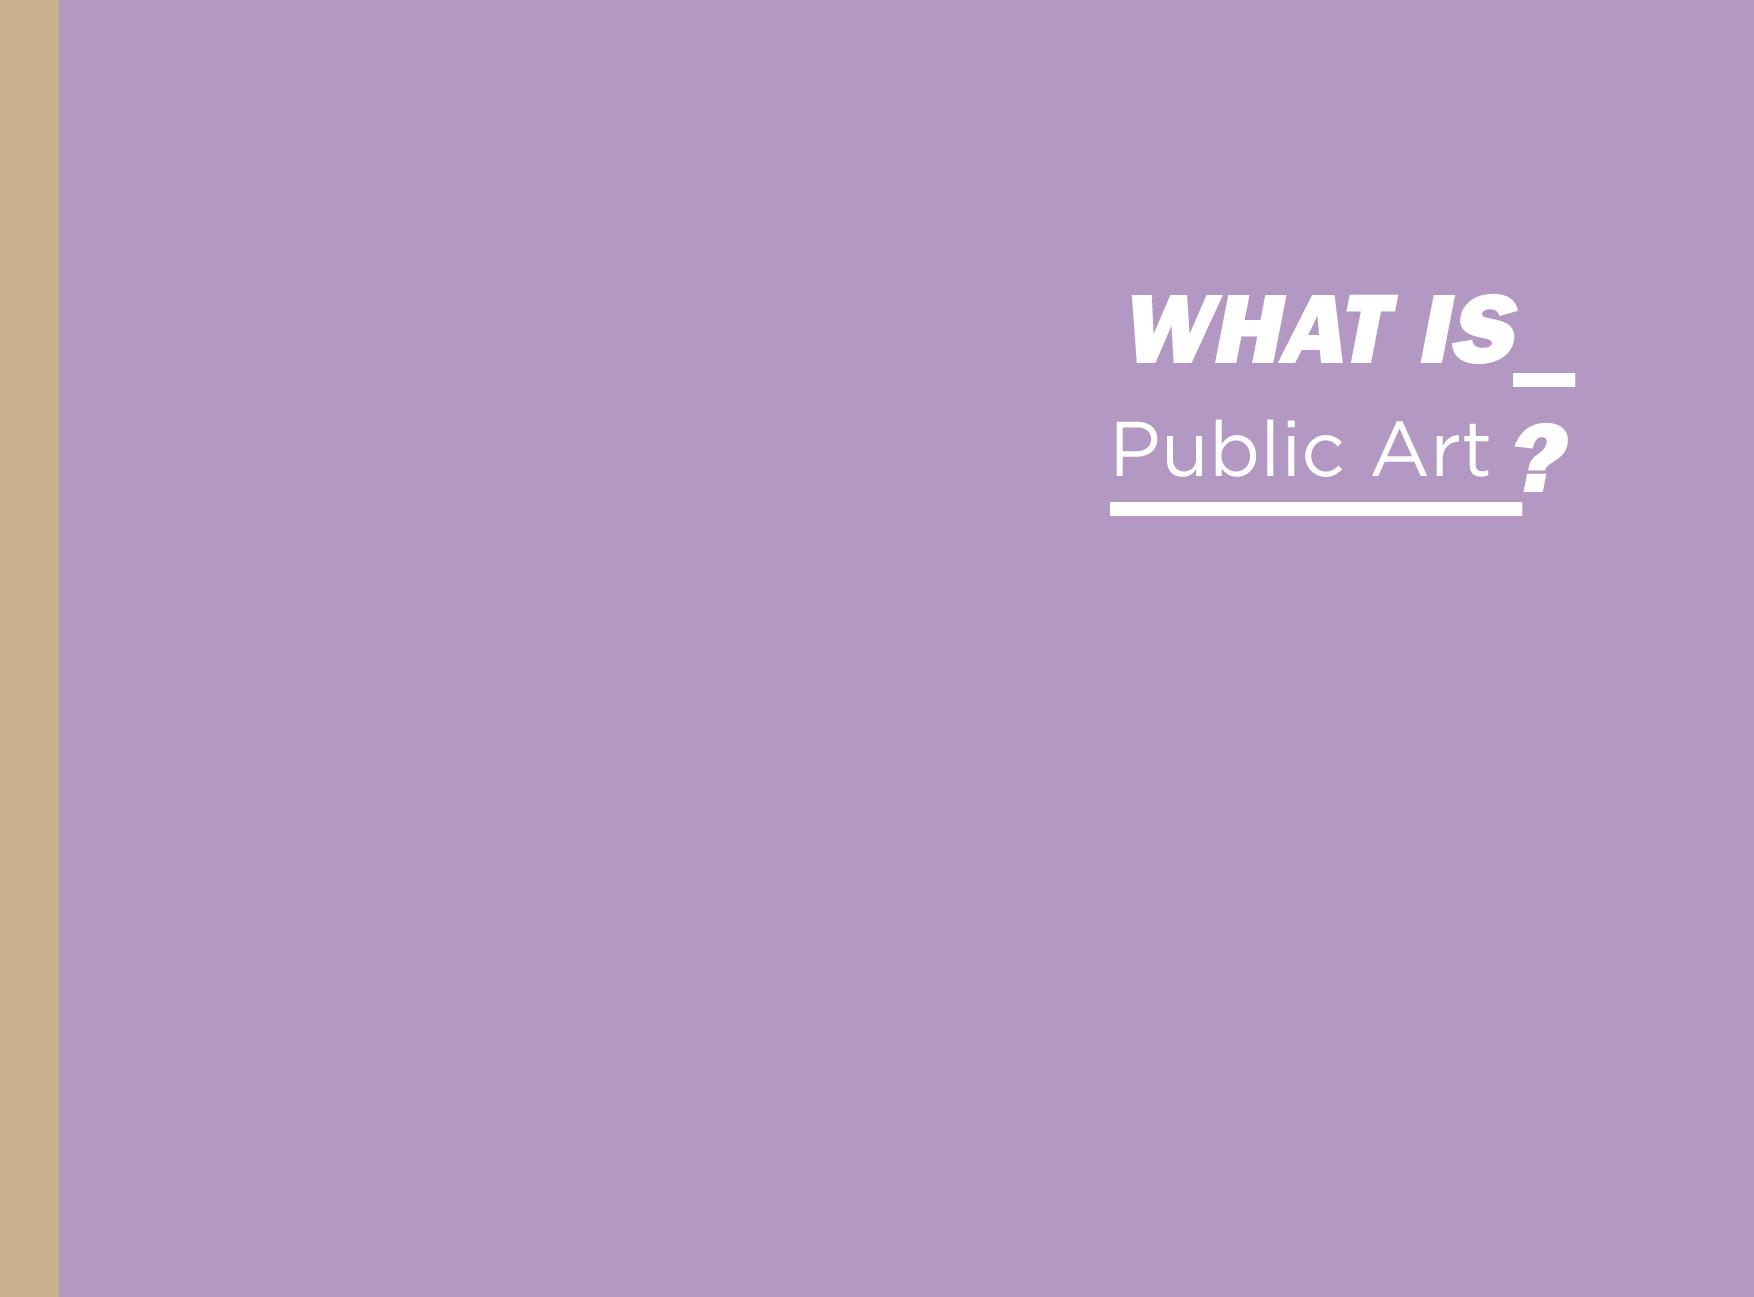 What is Public Art